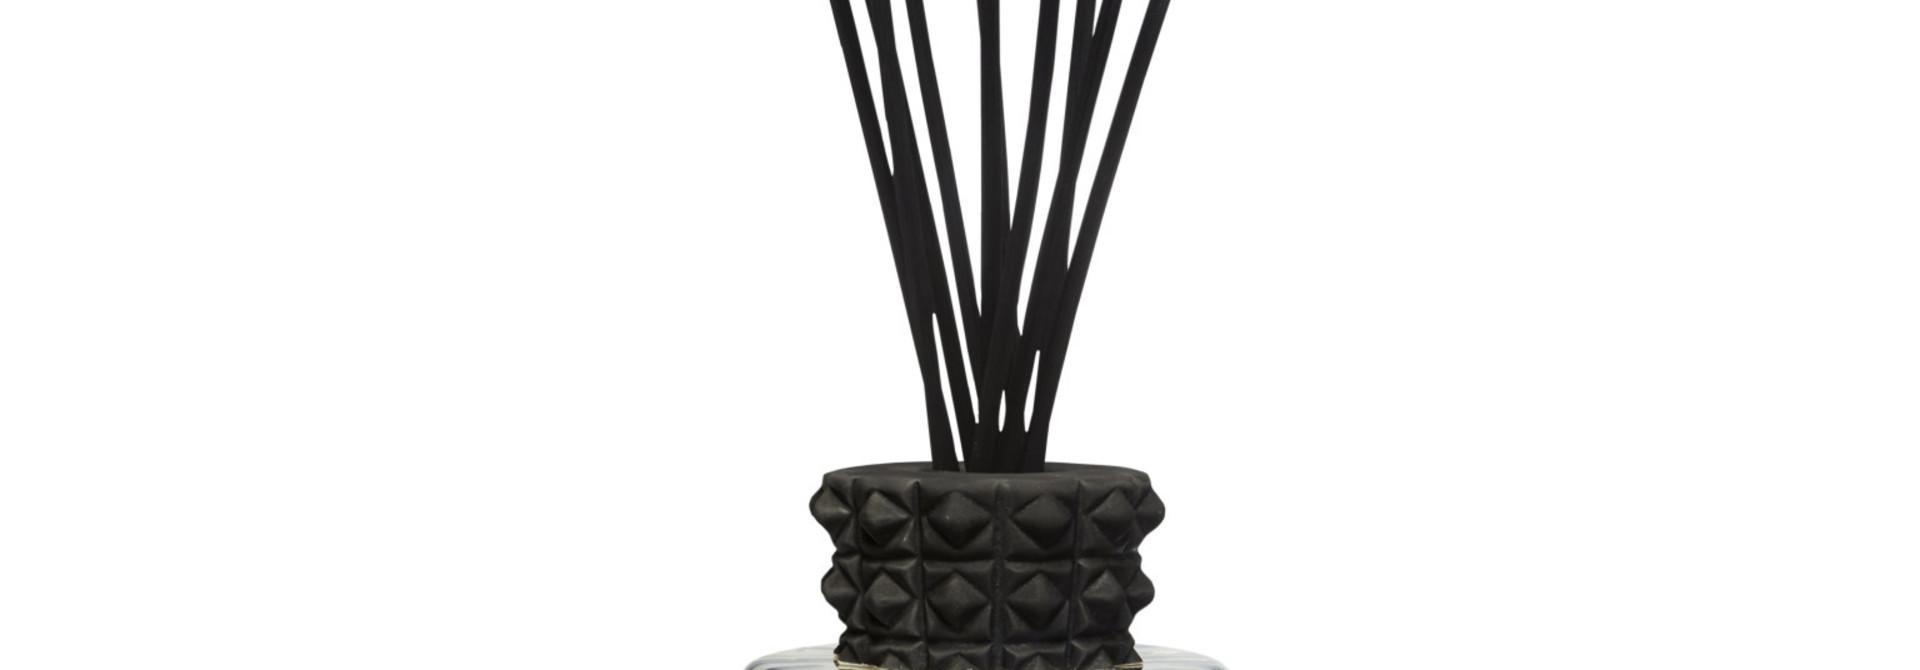 Totem 2L Black Pearls luxury bottle